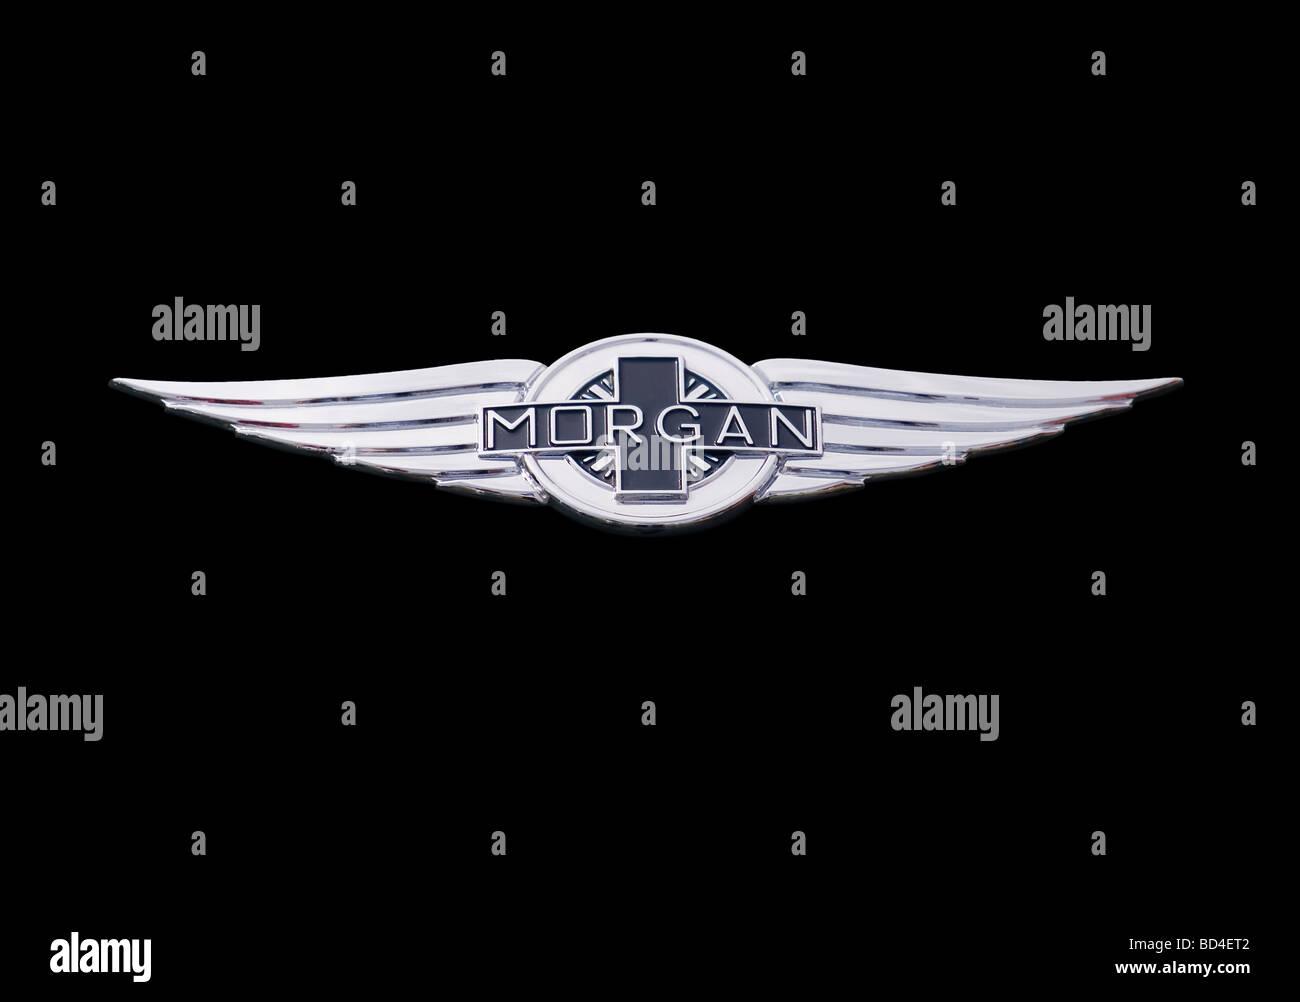 Morgan Cars Badge Logo Stock Photo 25300354 Alamy